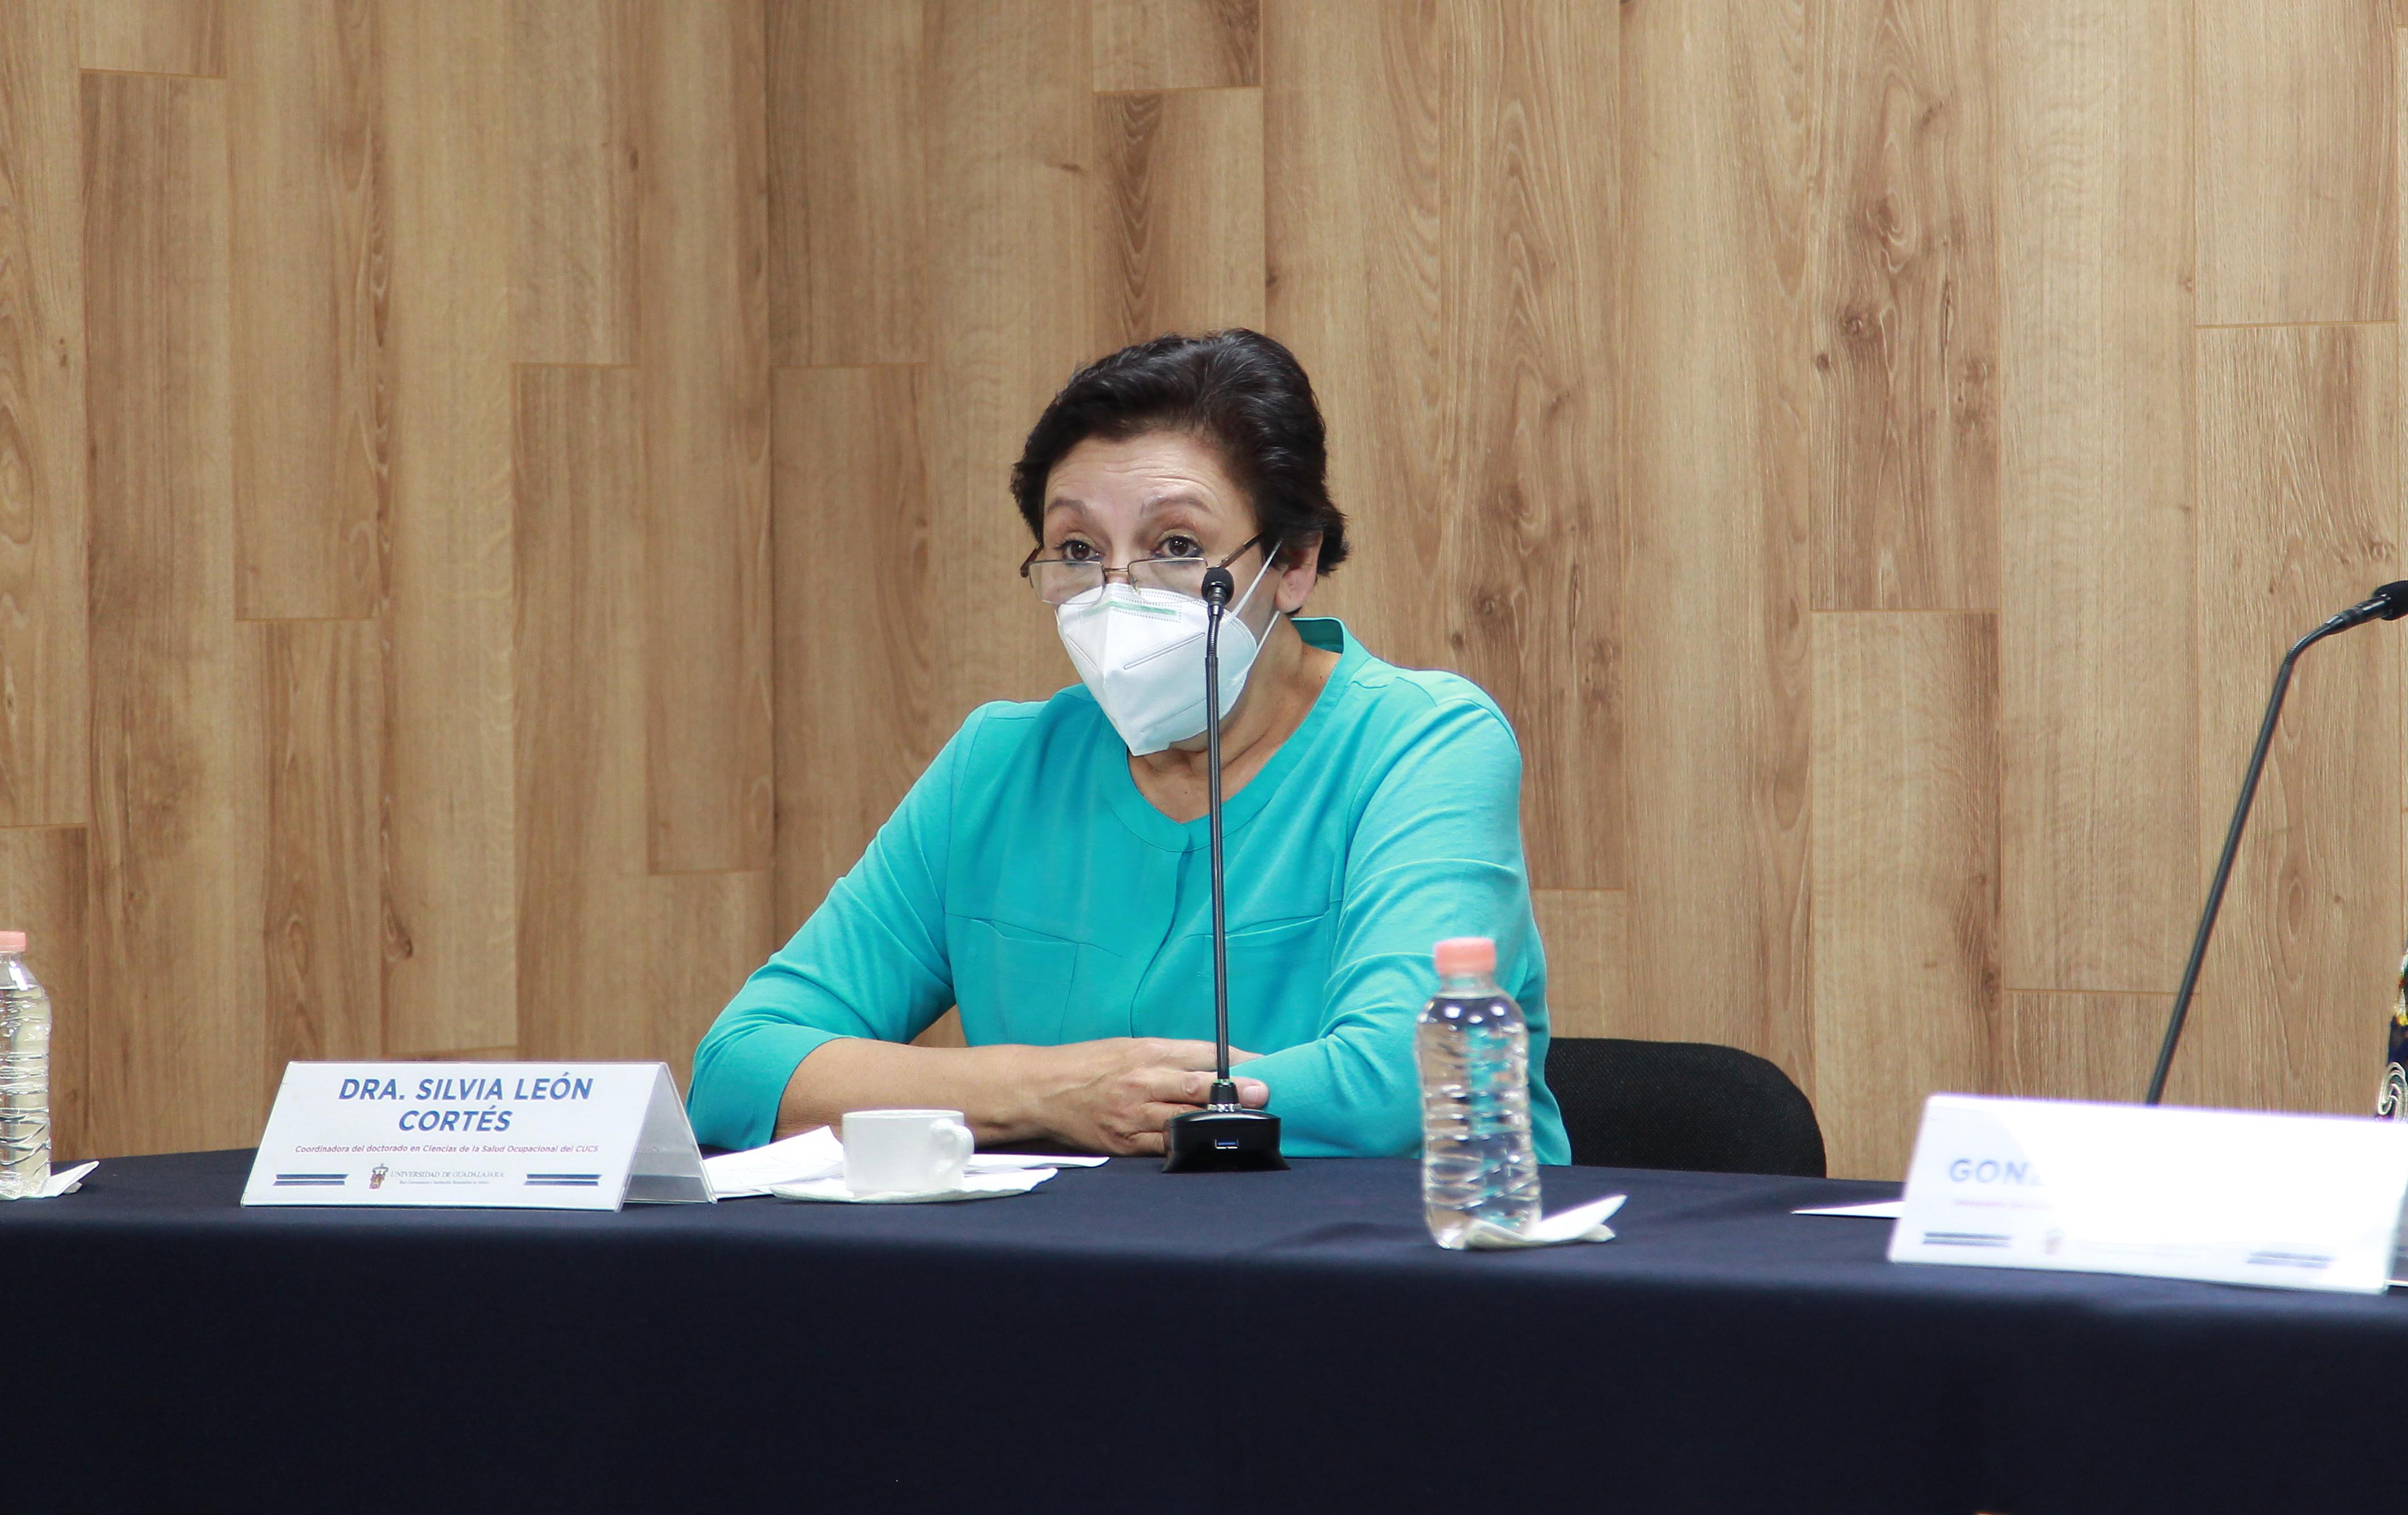 Dra Silvia León